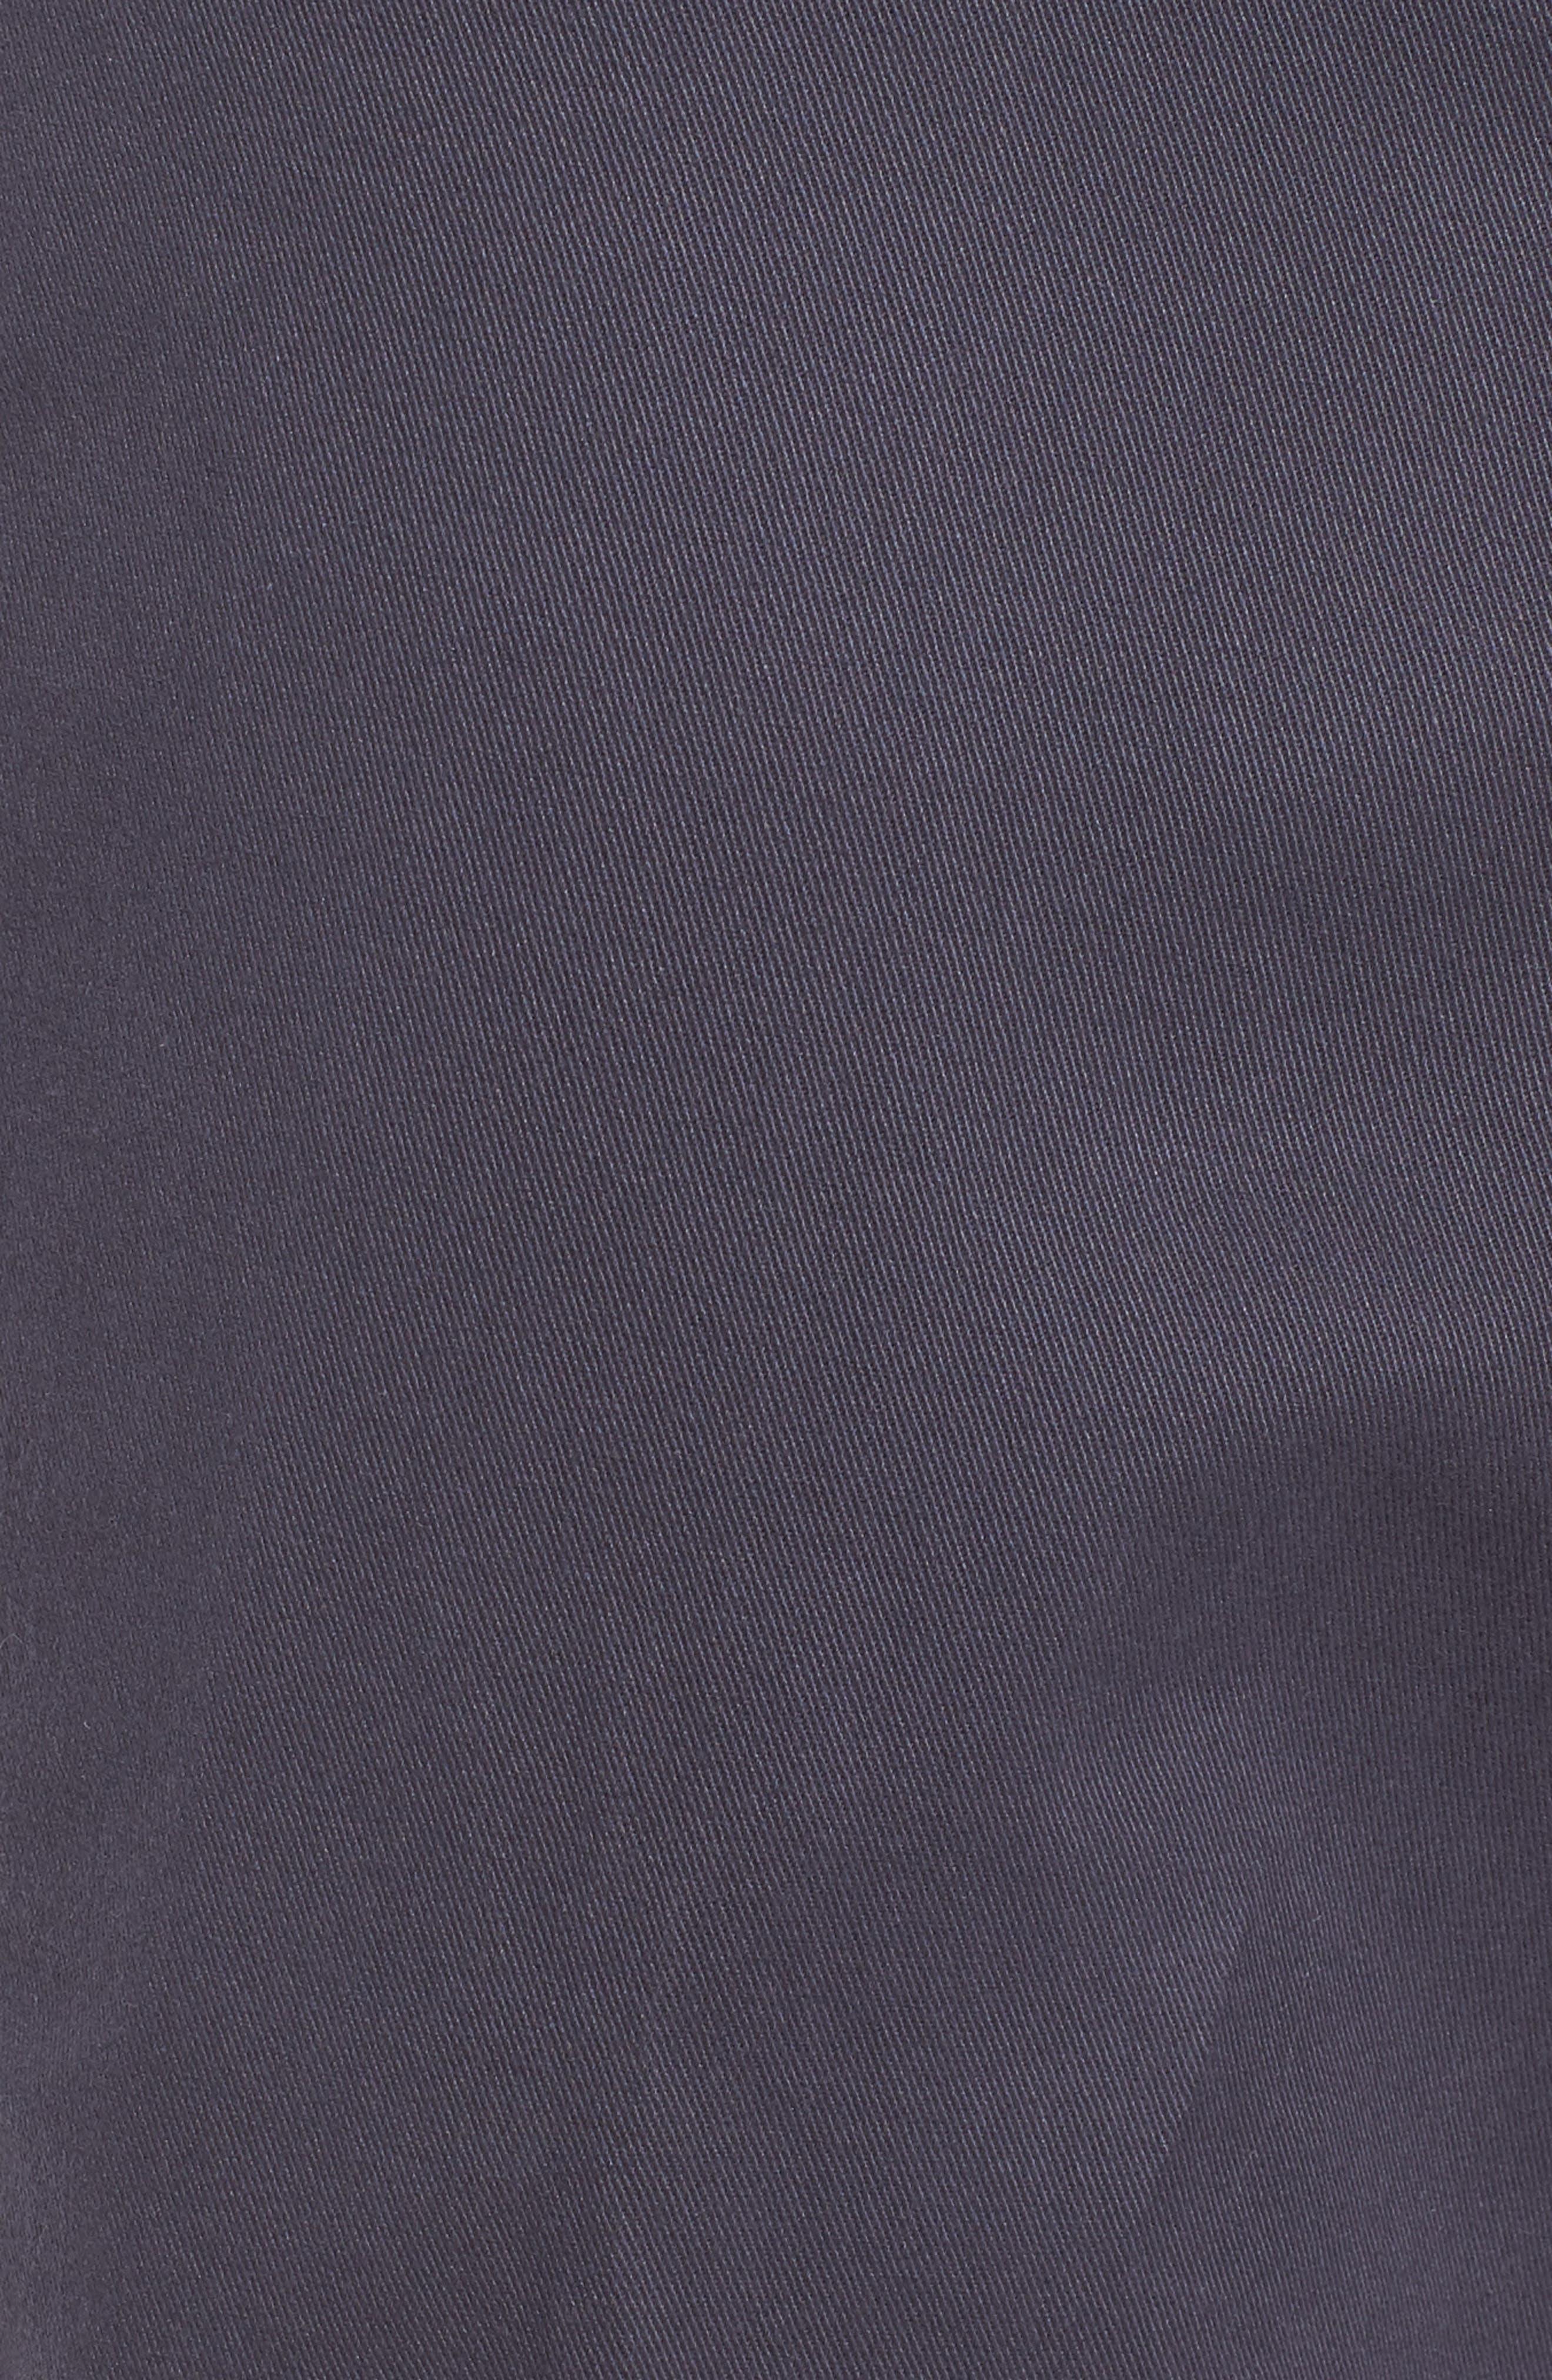 M2 Classic Fit Flat Front Vintage Twill Pants,                             Alternate thumbnail 5, color,                             410